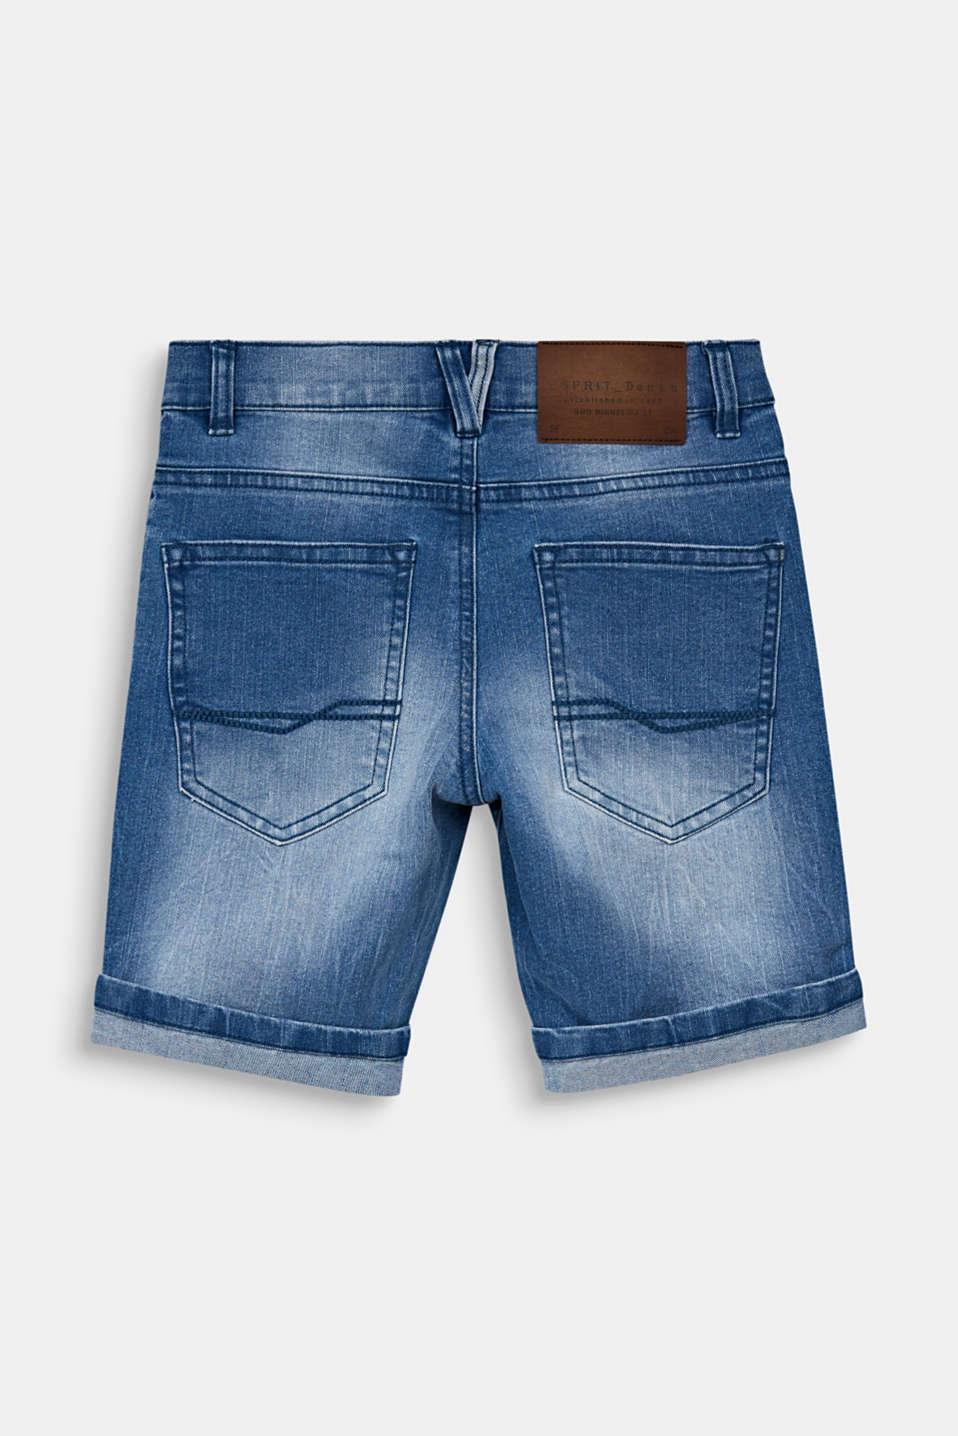 Denim shorts in a vintage finish, LCLIGHT INDIGO D, detail image number 1